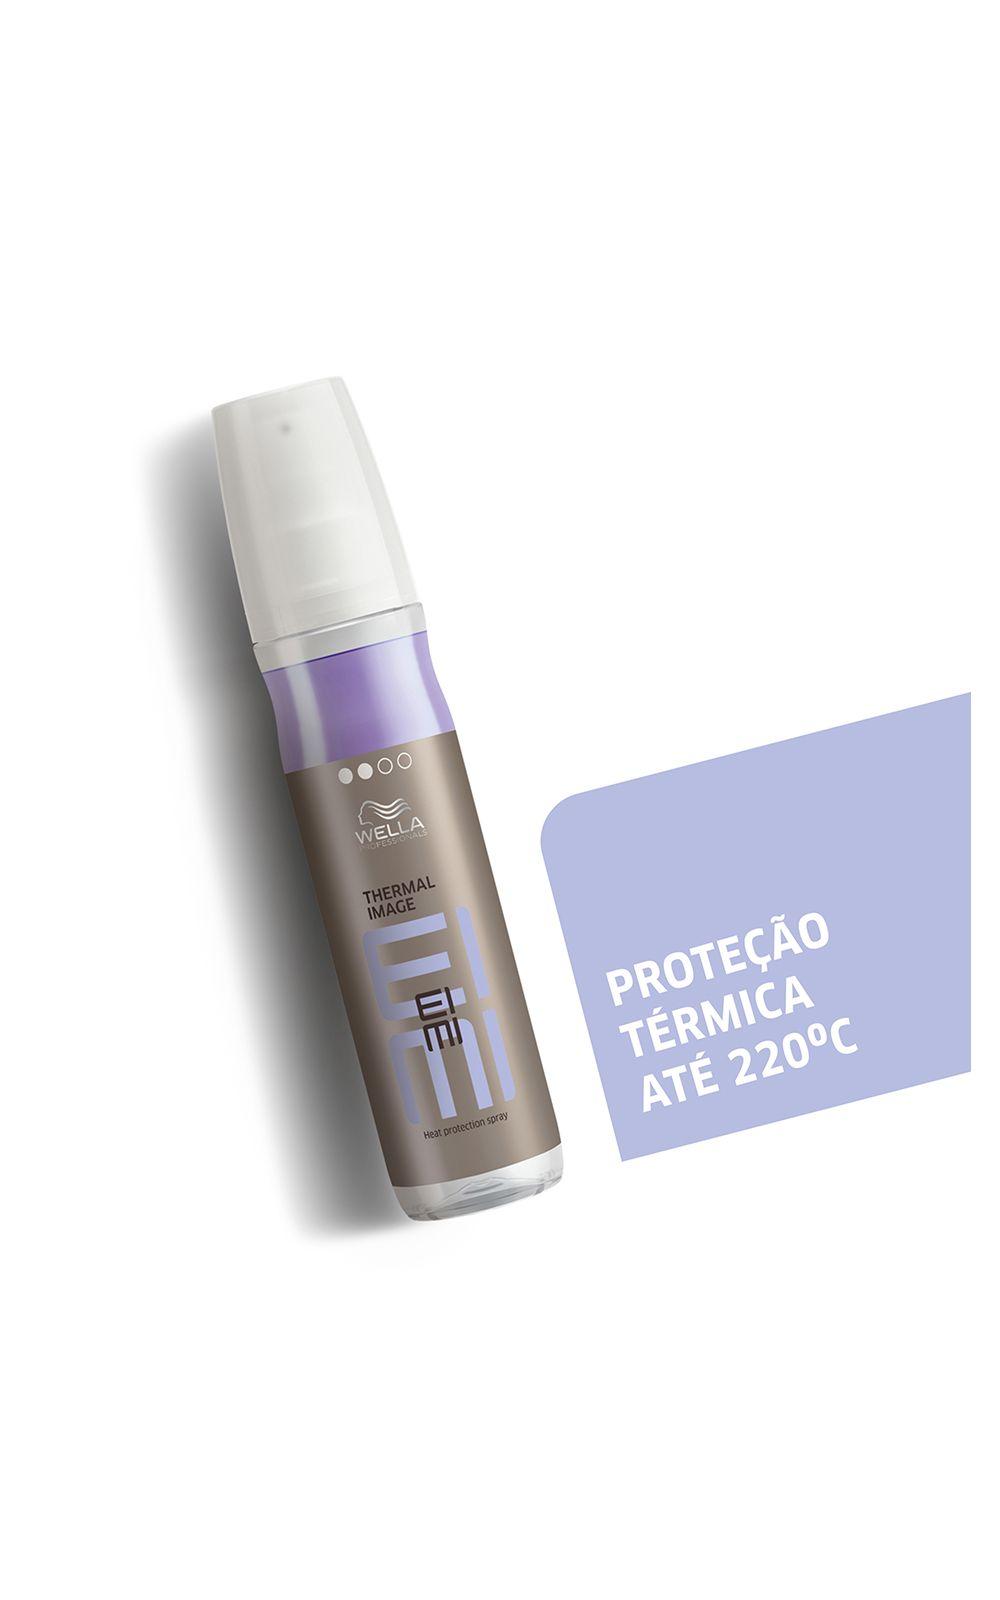 Foto 2 - Wella EIMI Thermal Image - Spray Modelador - 150ml